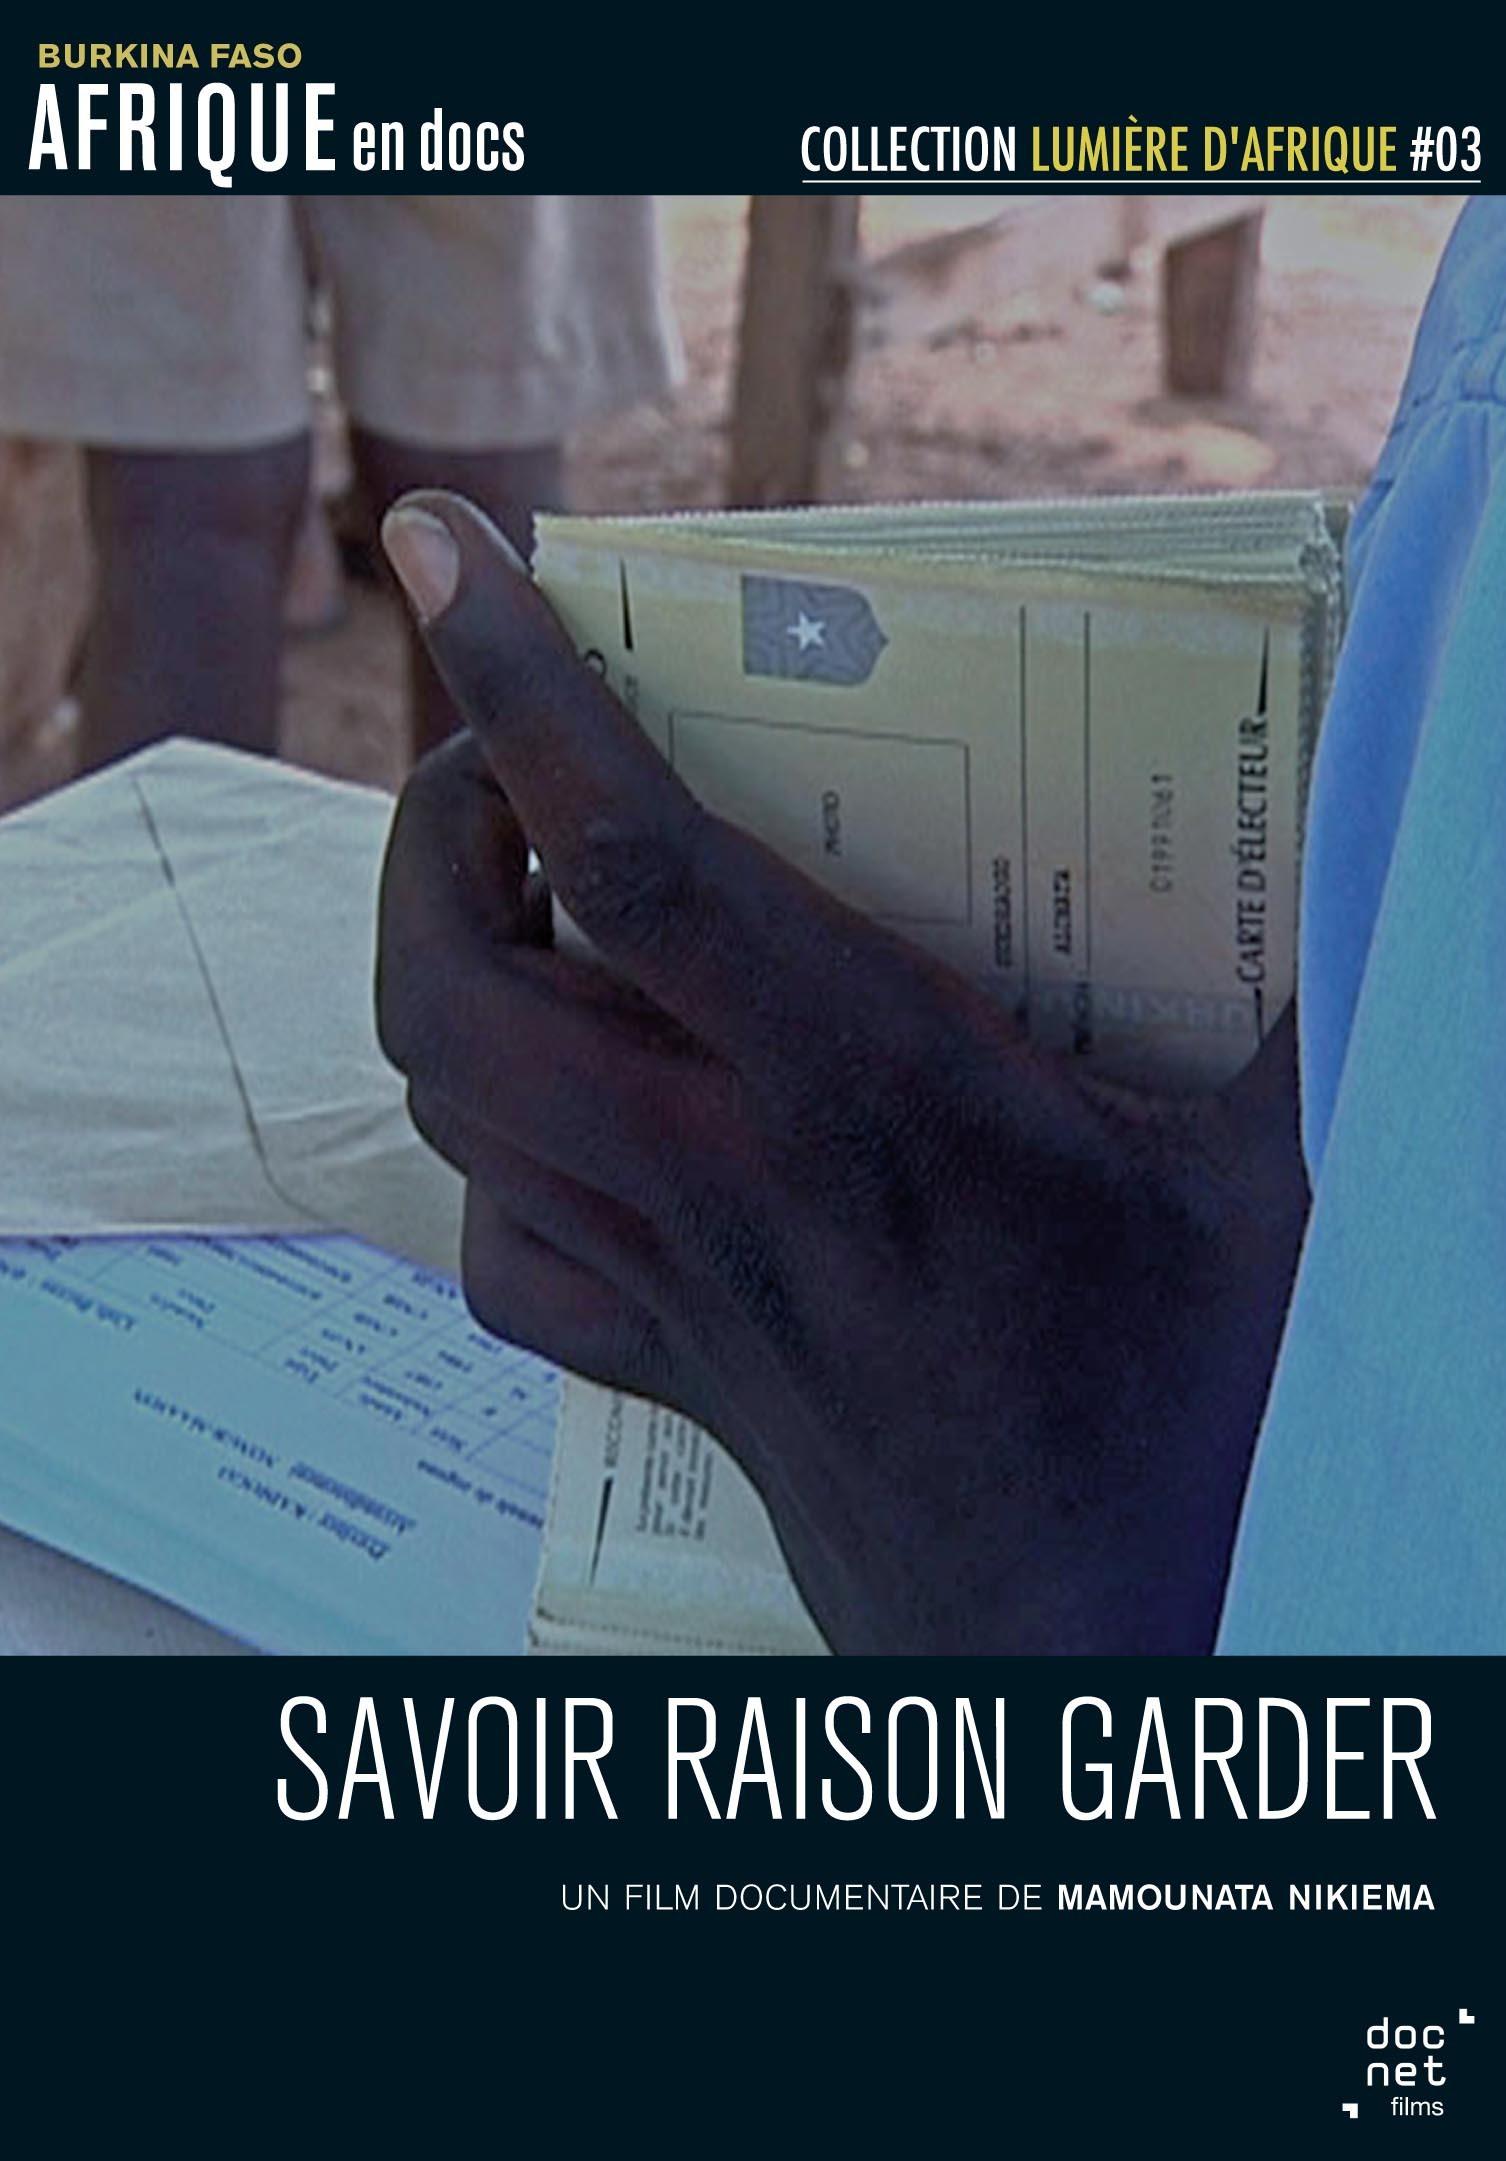 SAVOIR RAISON GARDER - DVD